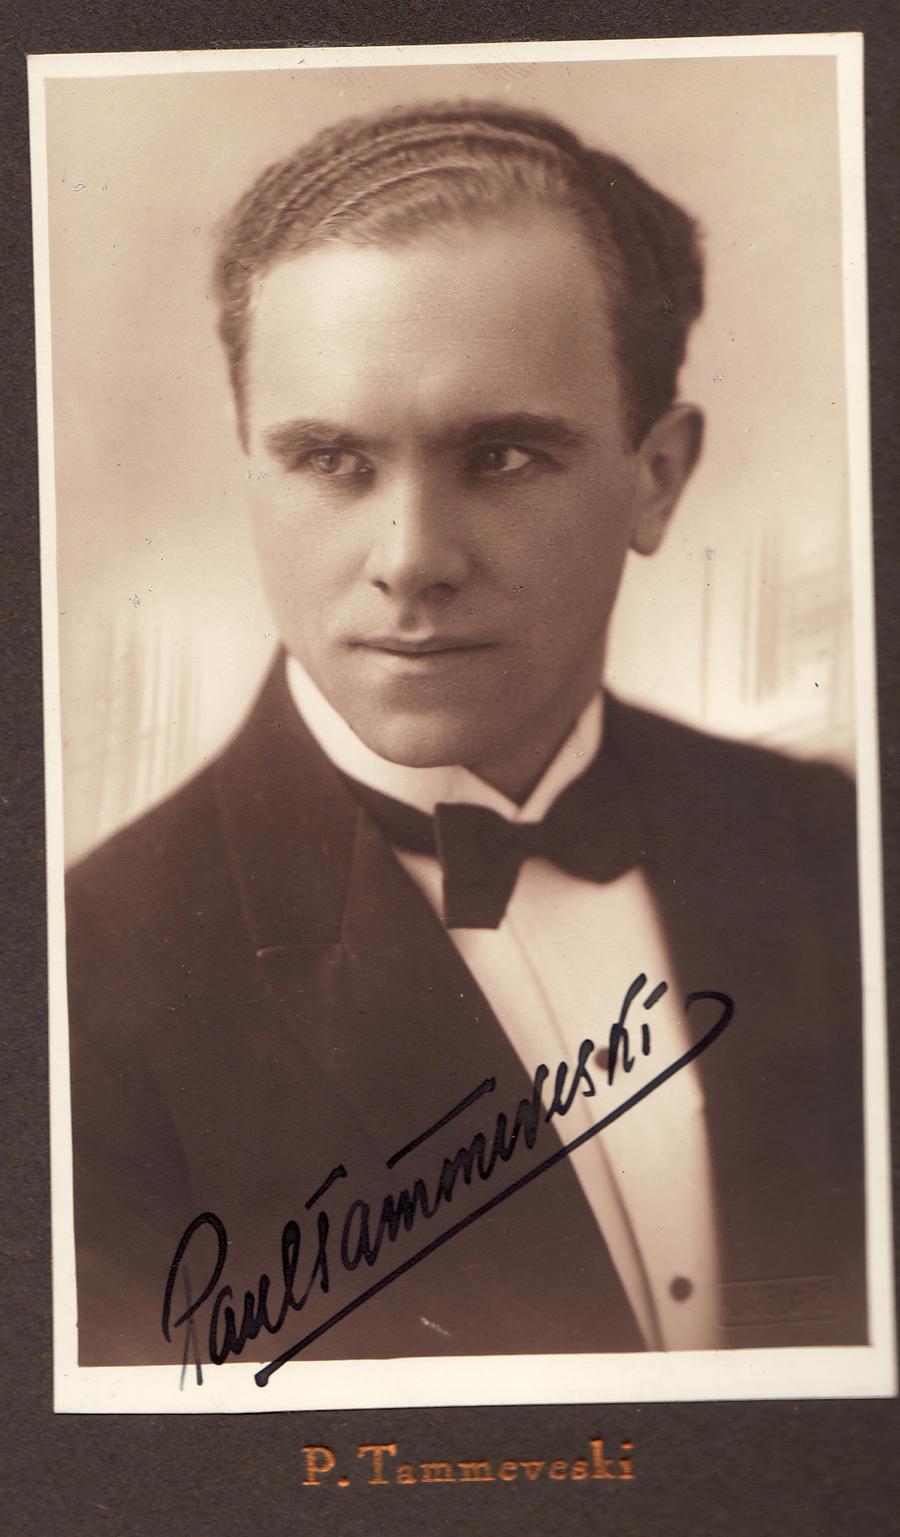 Paul Tammeveski